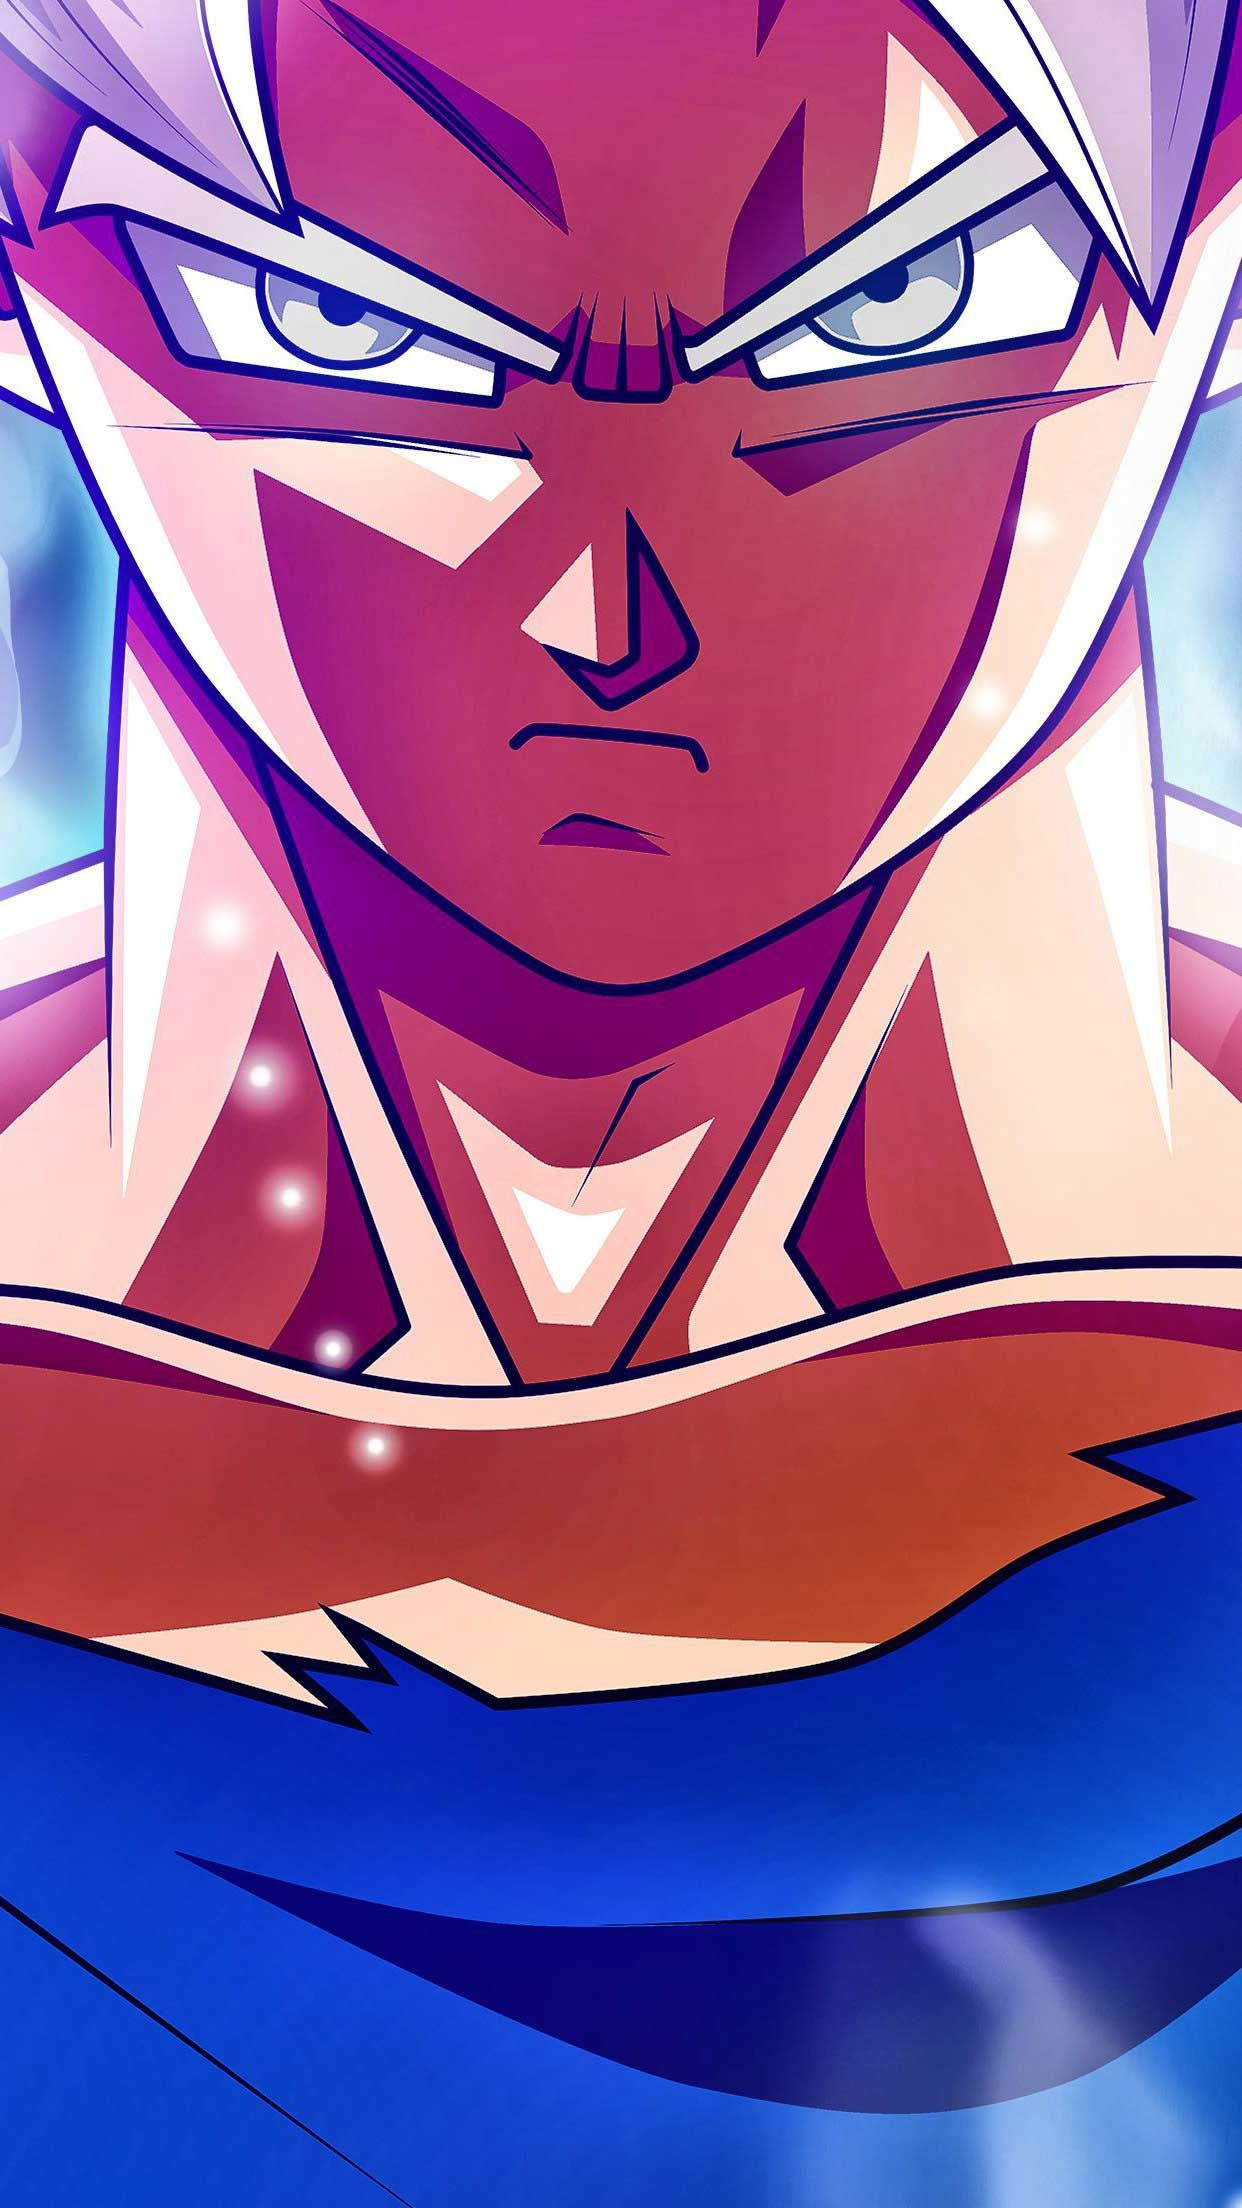 Goku Mastered Ultra Instinct K Ez Iphone Wallpapers Hd Goku Ultra Instinct Wallpaper Goku Wallpaper Iphone Goku Wallpaper